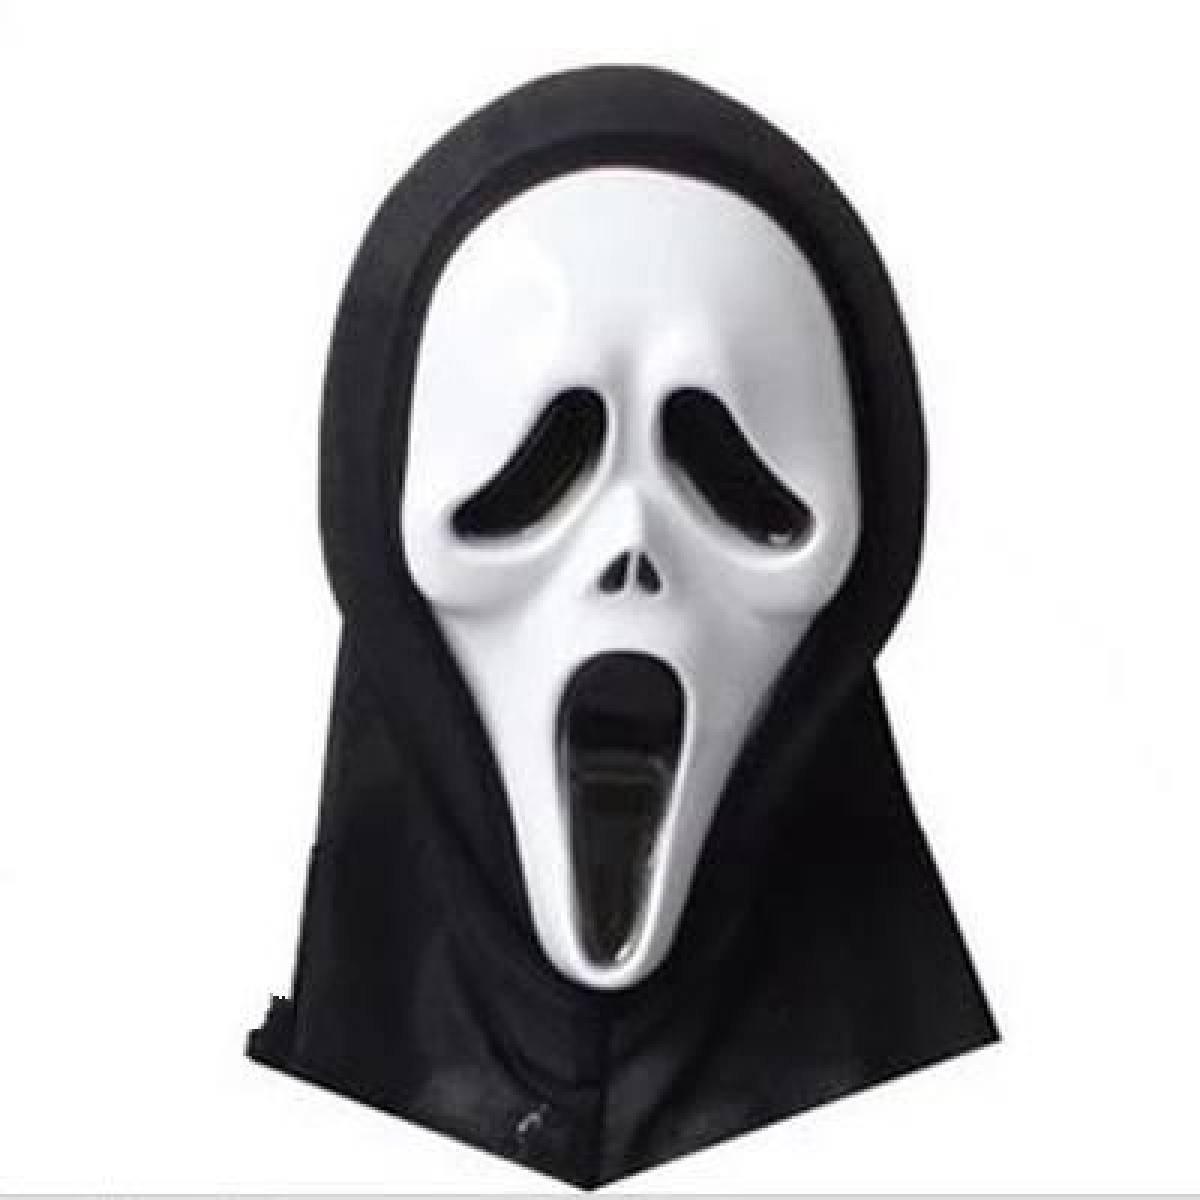 Nihiug Halloween Masquerade Horror Mit Geistern Ganze Leute Horror Hölle Mann Latex Pest Vogel Maske Doktor Maske,A